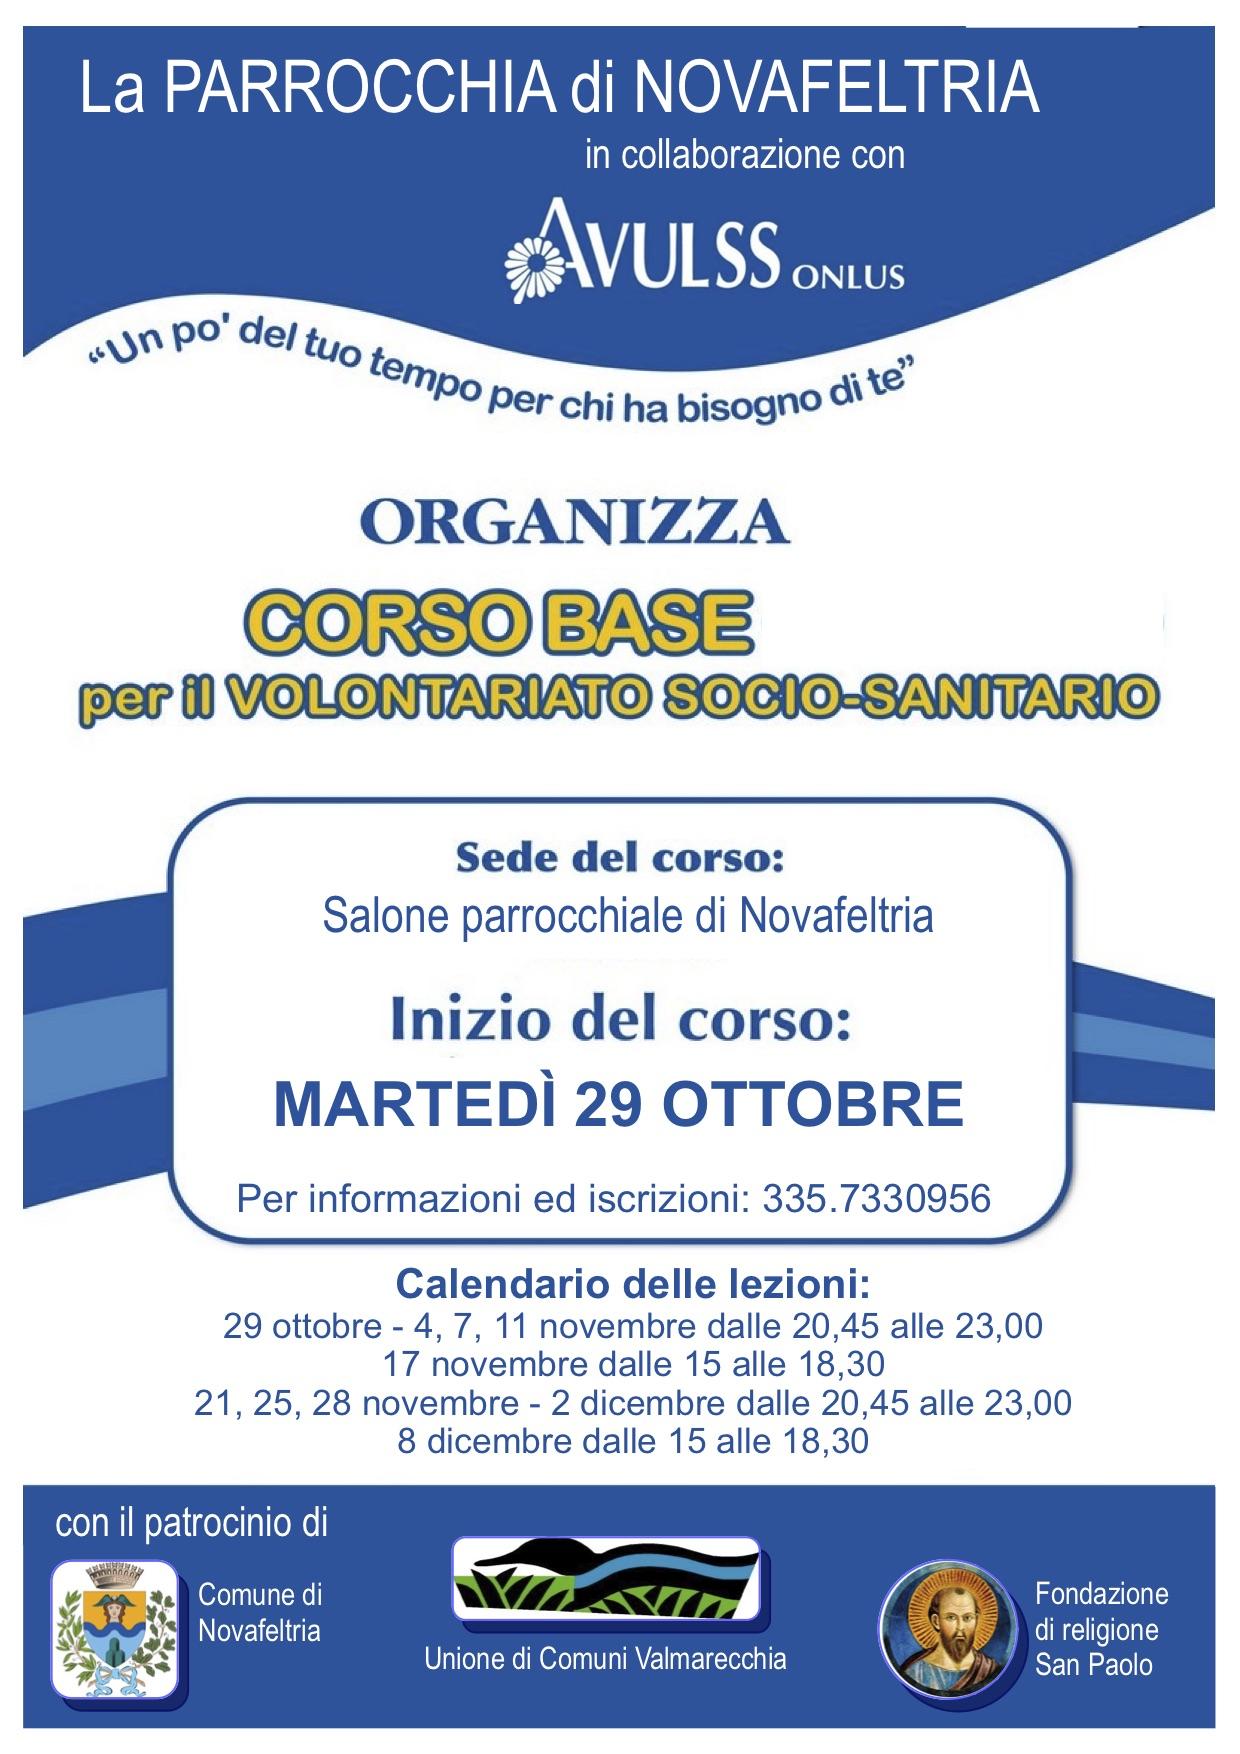 Corso base per Volontariato Socio-Sanitario (Novafeltria -Rimini)